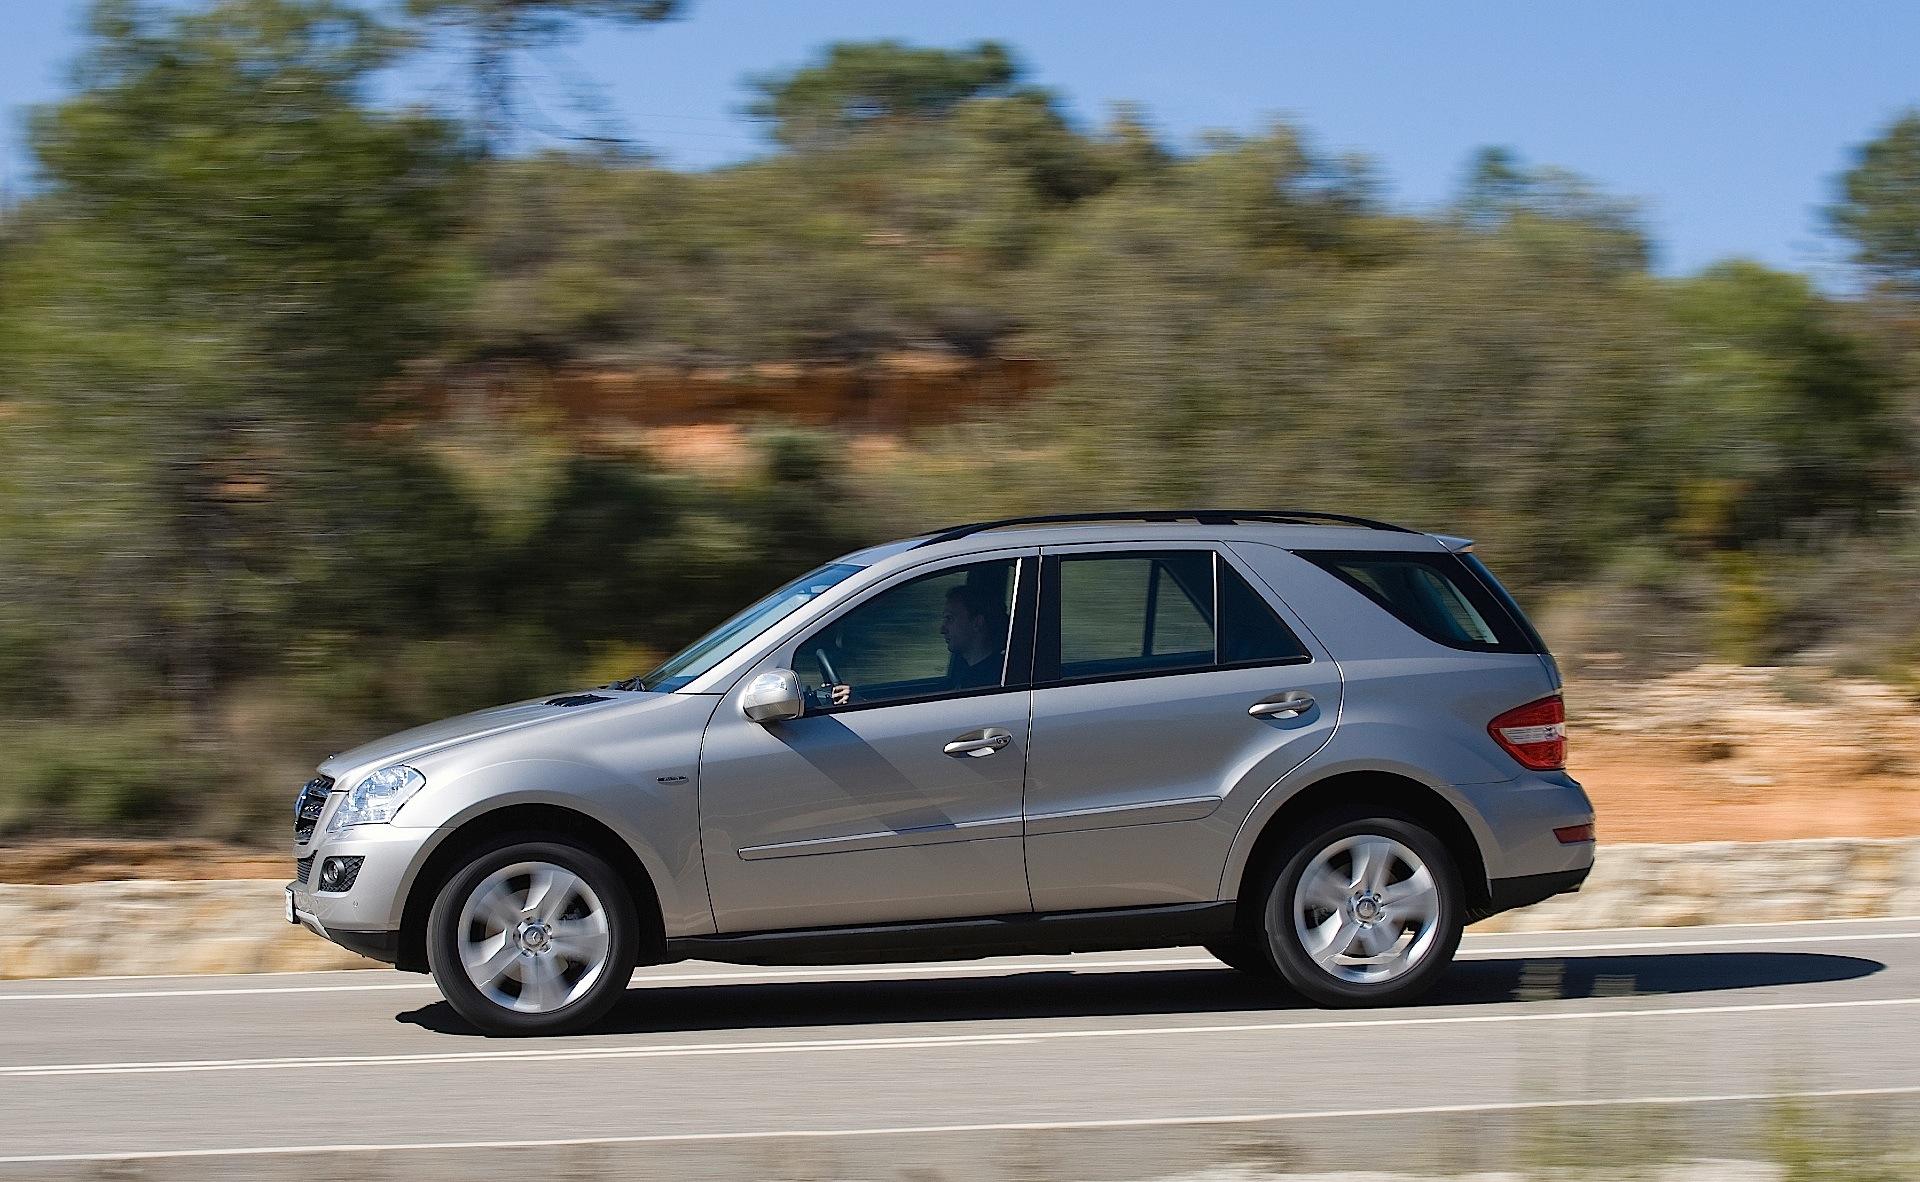 Mercedes benz ml klasse w164 specs 2008 2009 2010 for Mercedes benz w164